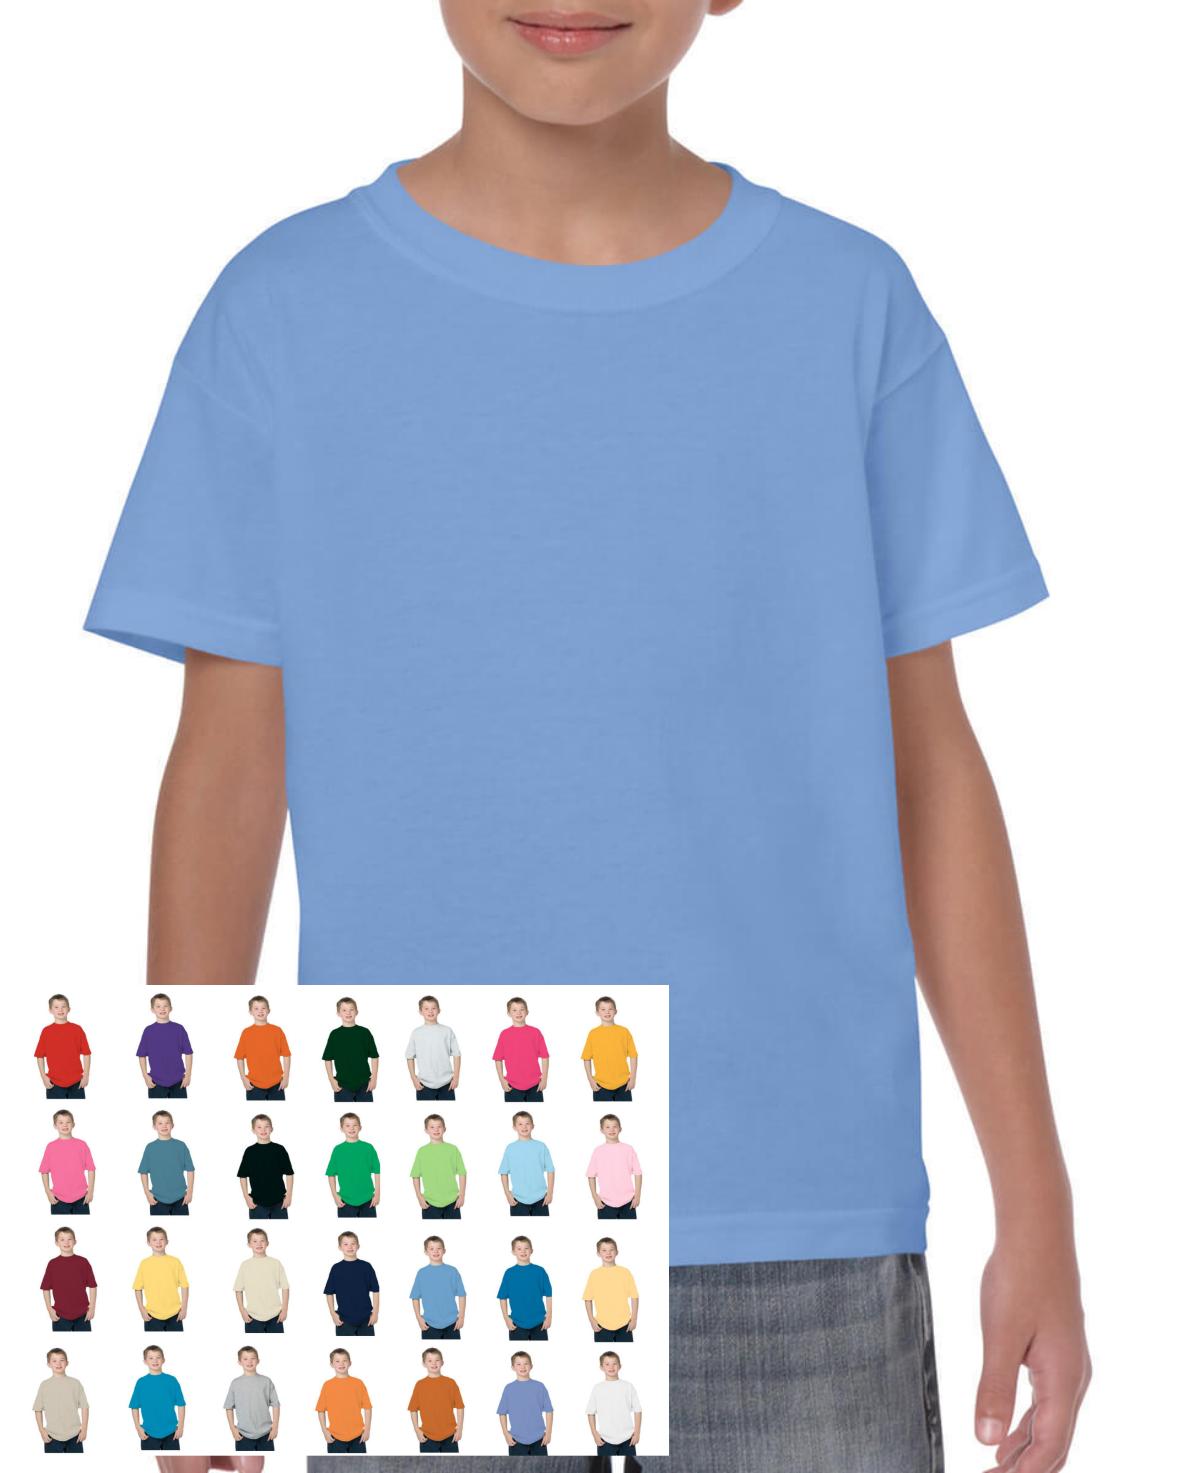 Gildan Youth Kid's Child Adult Cotton T-shirt Plain Blank G5